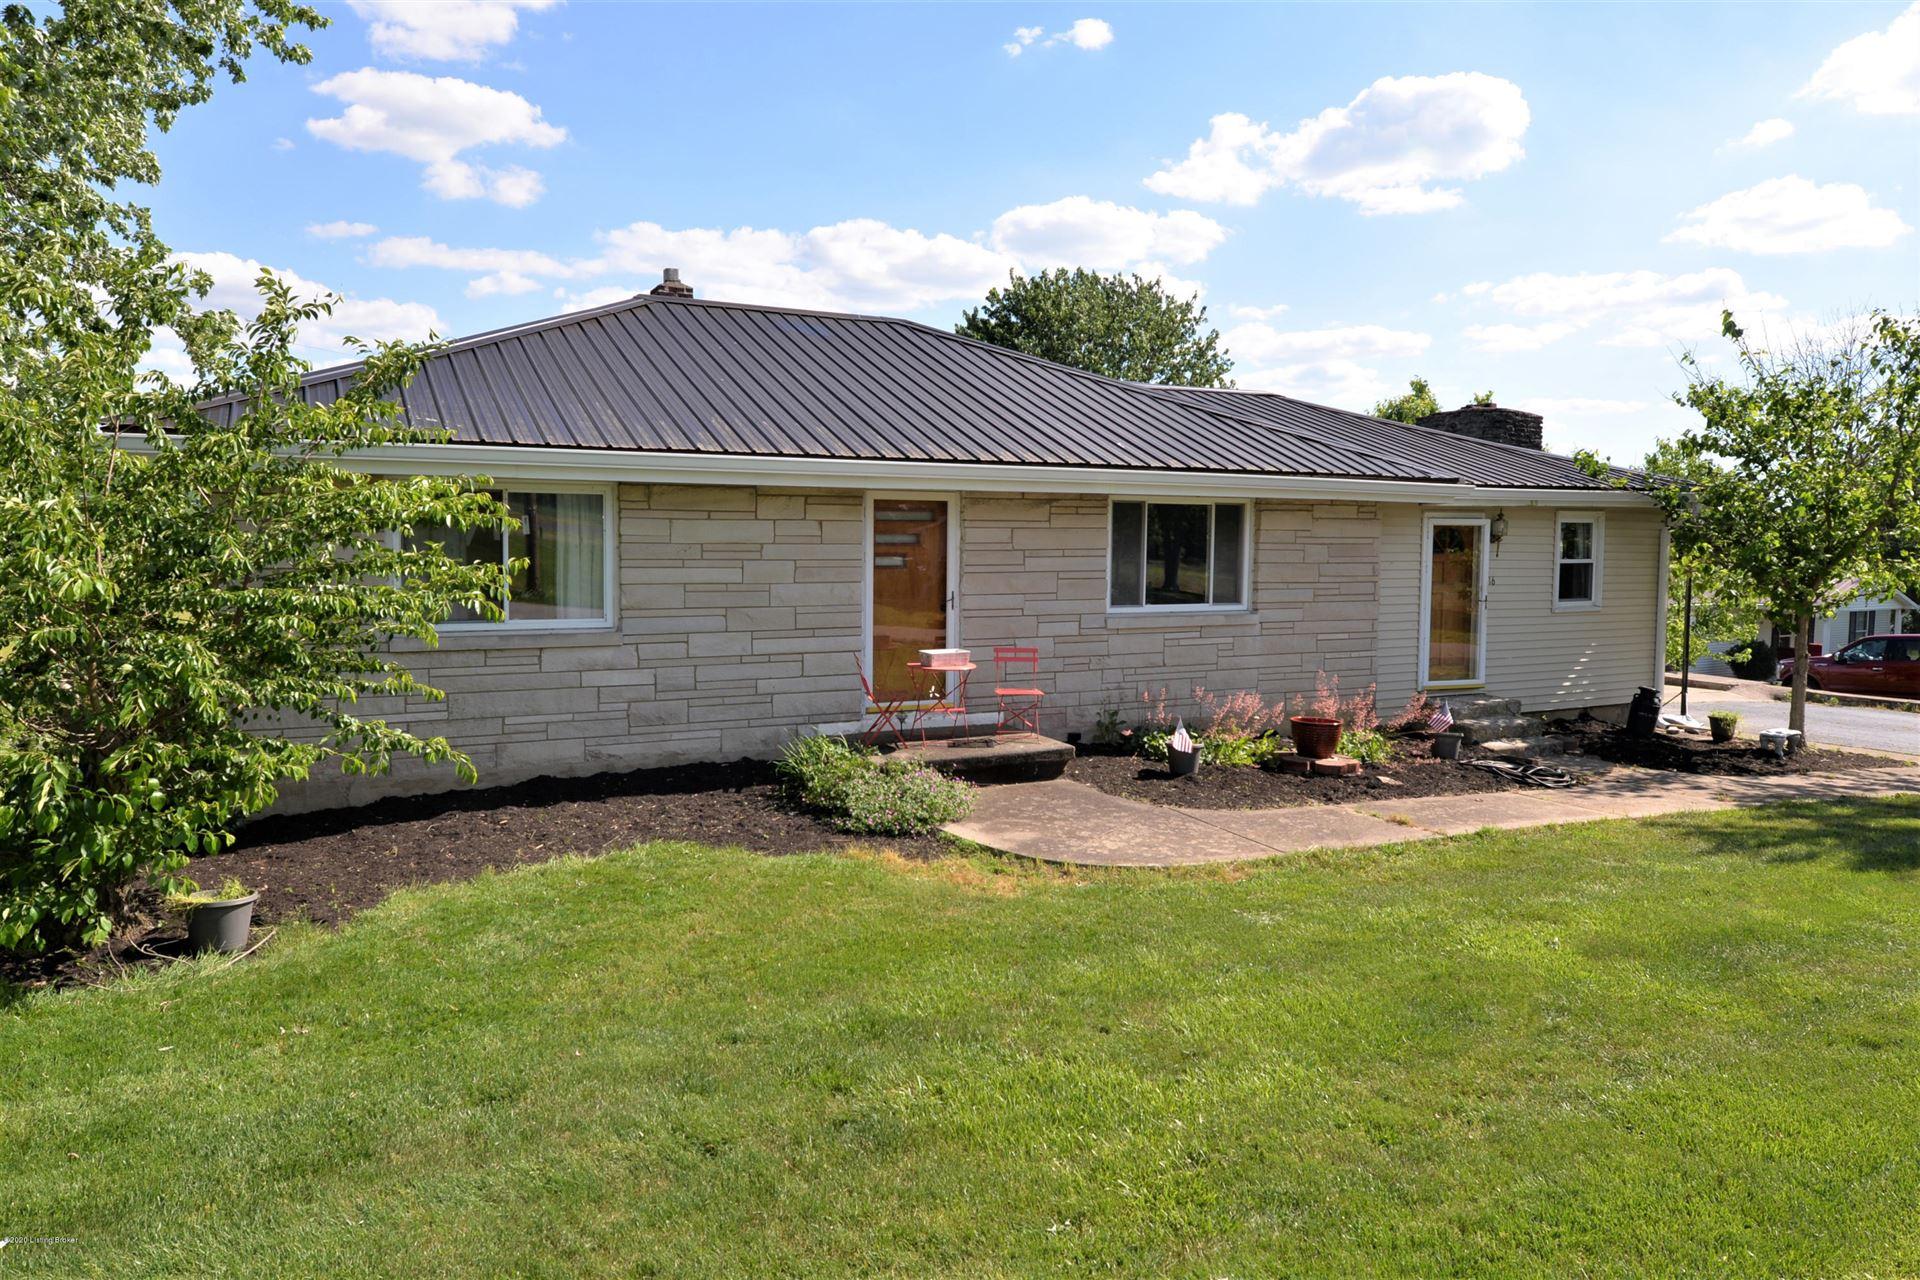 Property Image Of 116 E Howard St In Glencoe, Ky